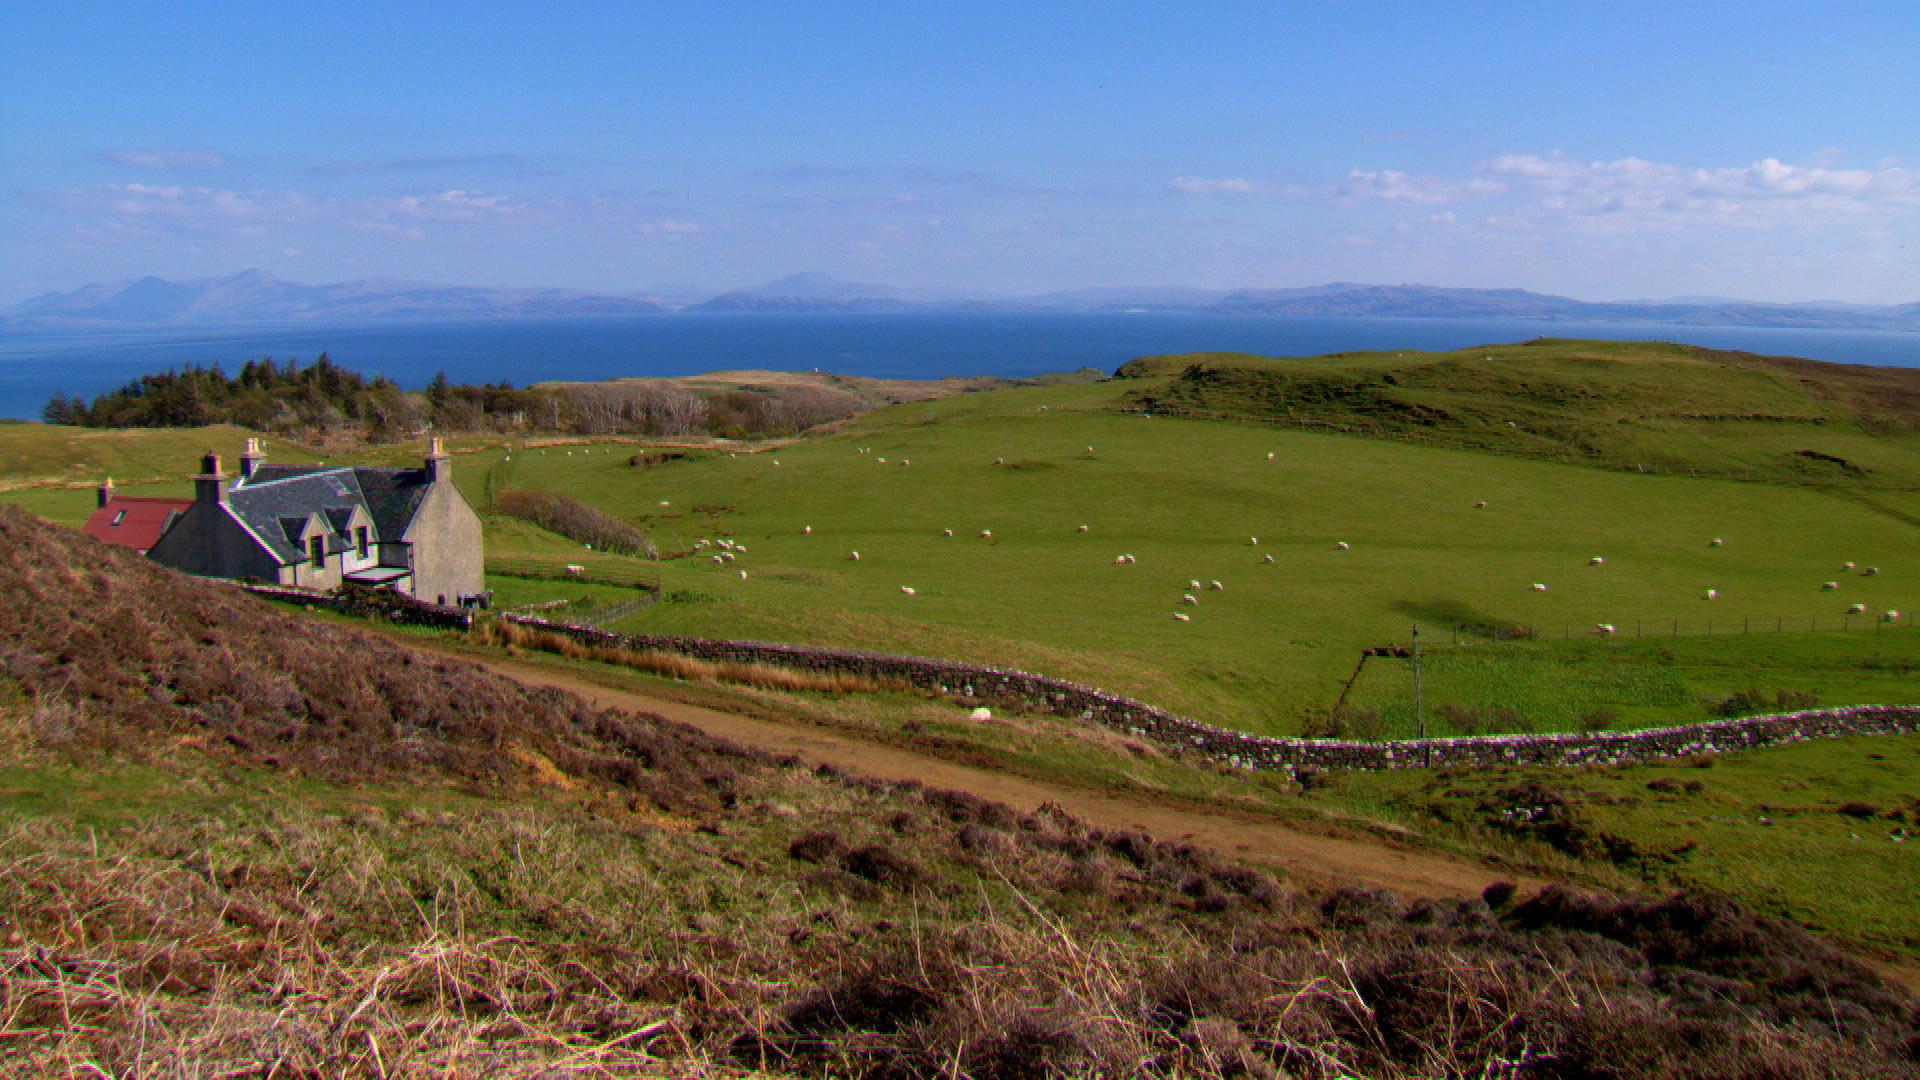 60 Minutes Adventure To The Isle Of Eigg Cbs News